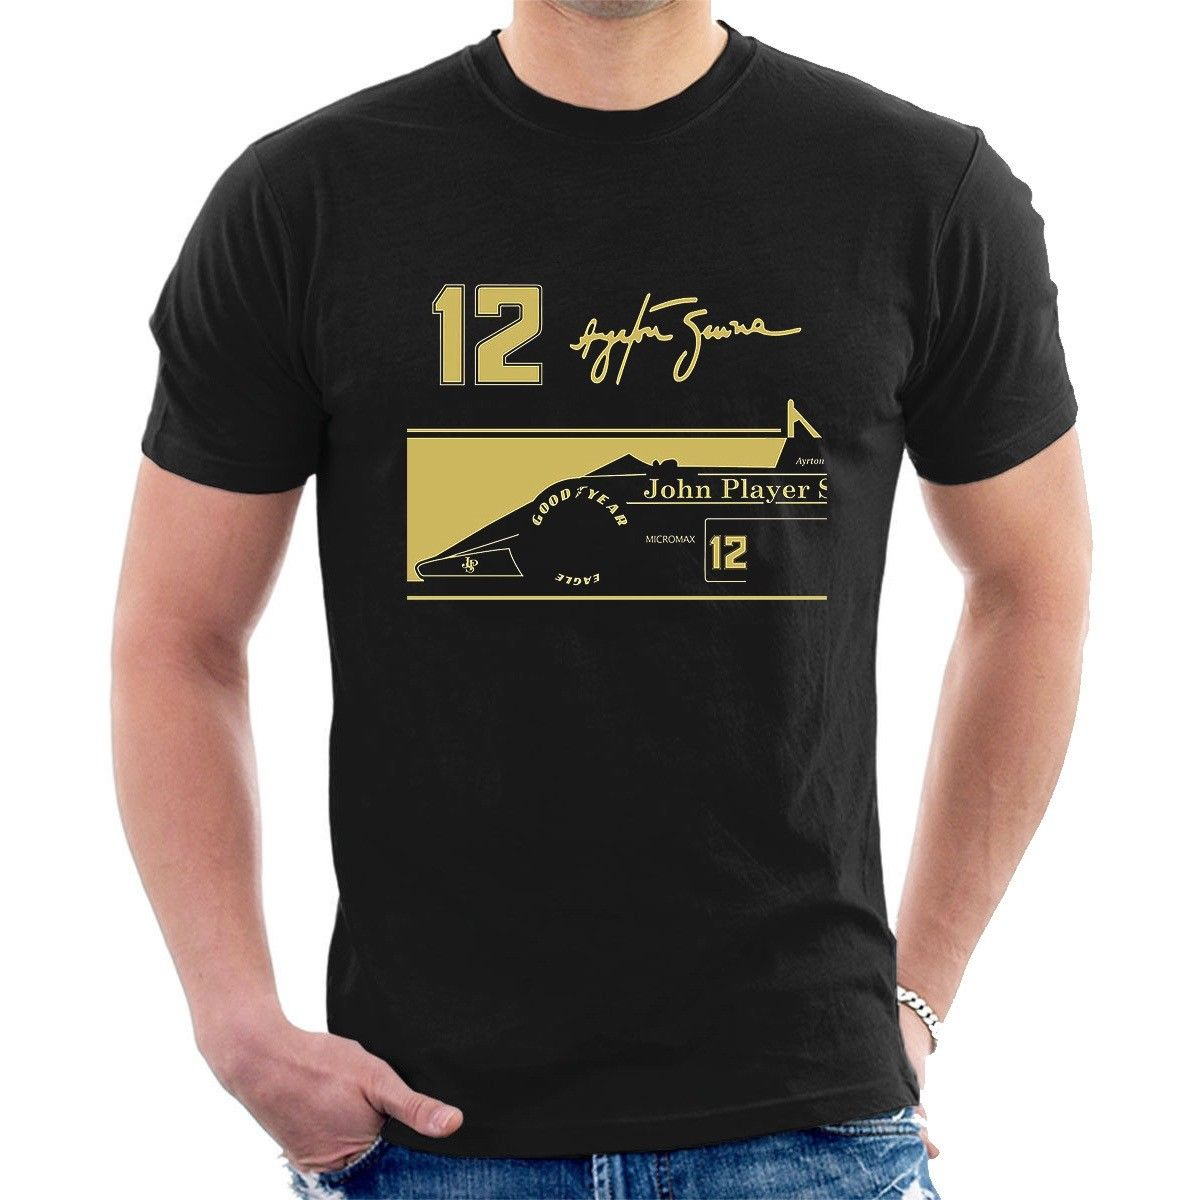 2018-new-fashion-casual-men-t-shirt-novelty-o-neck-tops-ayrton-font-b-senna-b-font-jps-tribute-t-shirt-12-signature-bulk-t-shirts